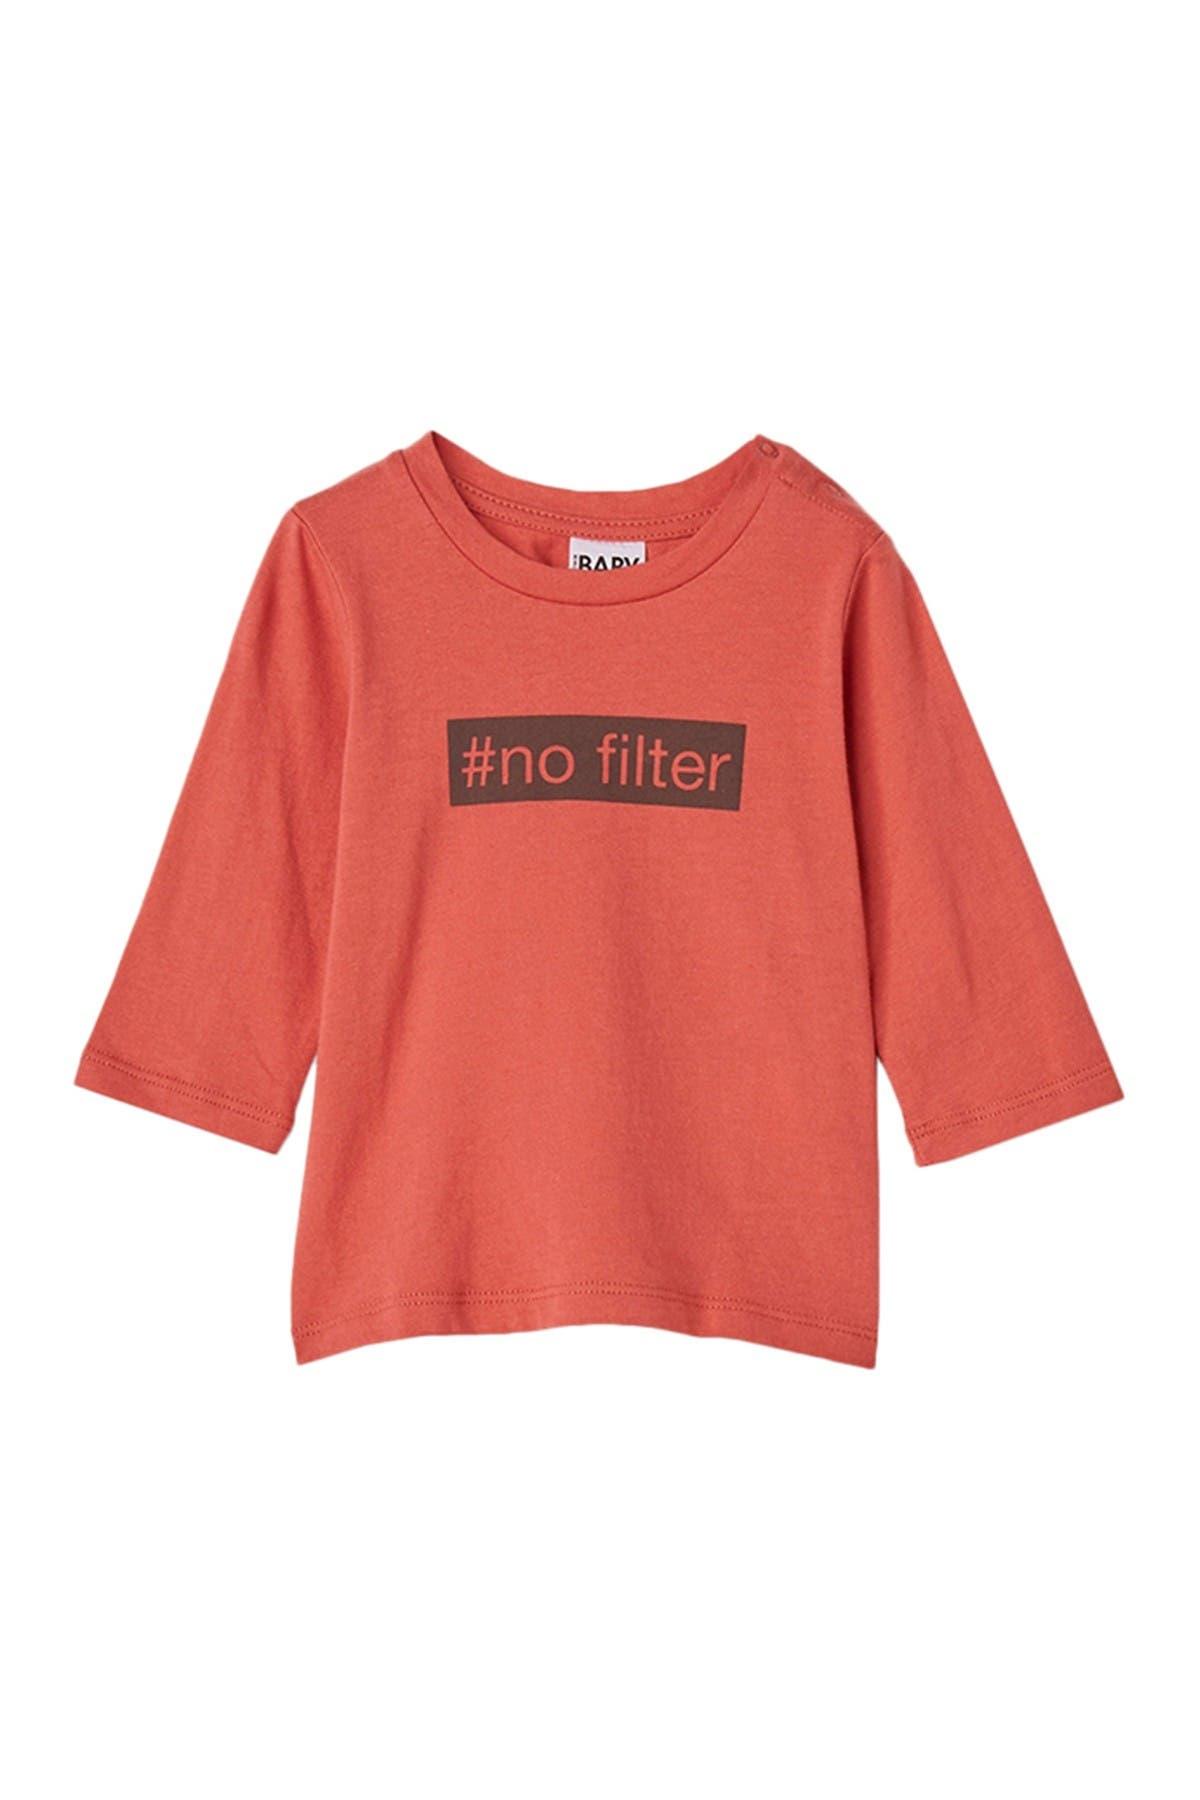 Image of Cotton On Jamie Long Sleeve T-Shirt